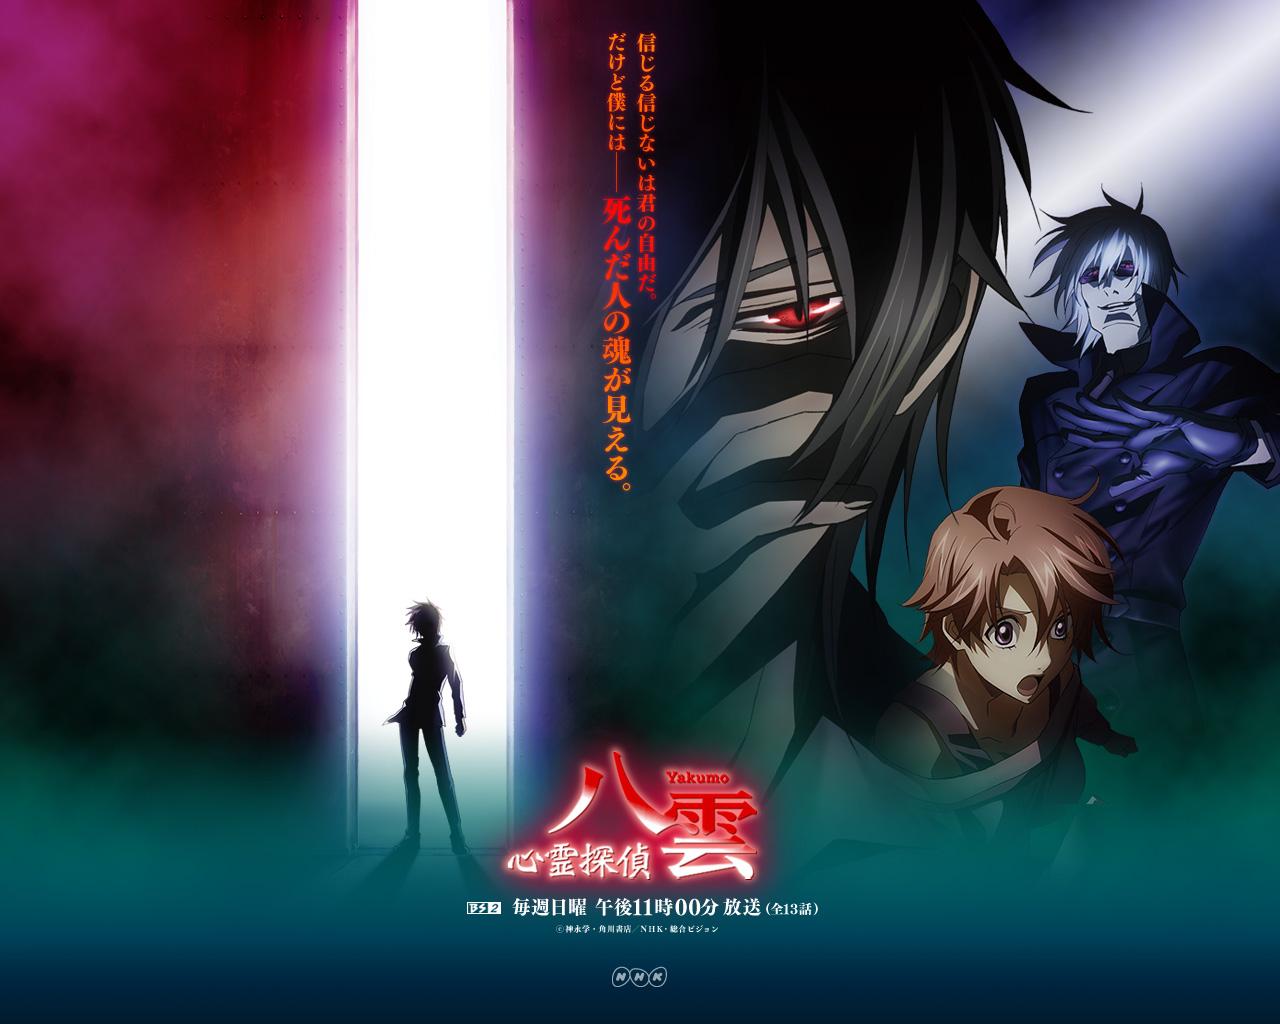 Forbidden Forest Psychic Detective Yakumo Anime Wallpaper 壁紙